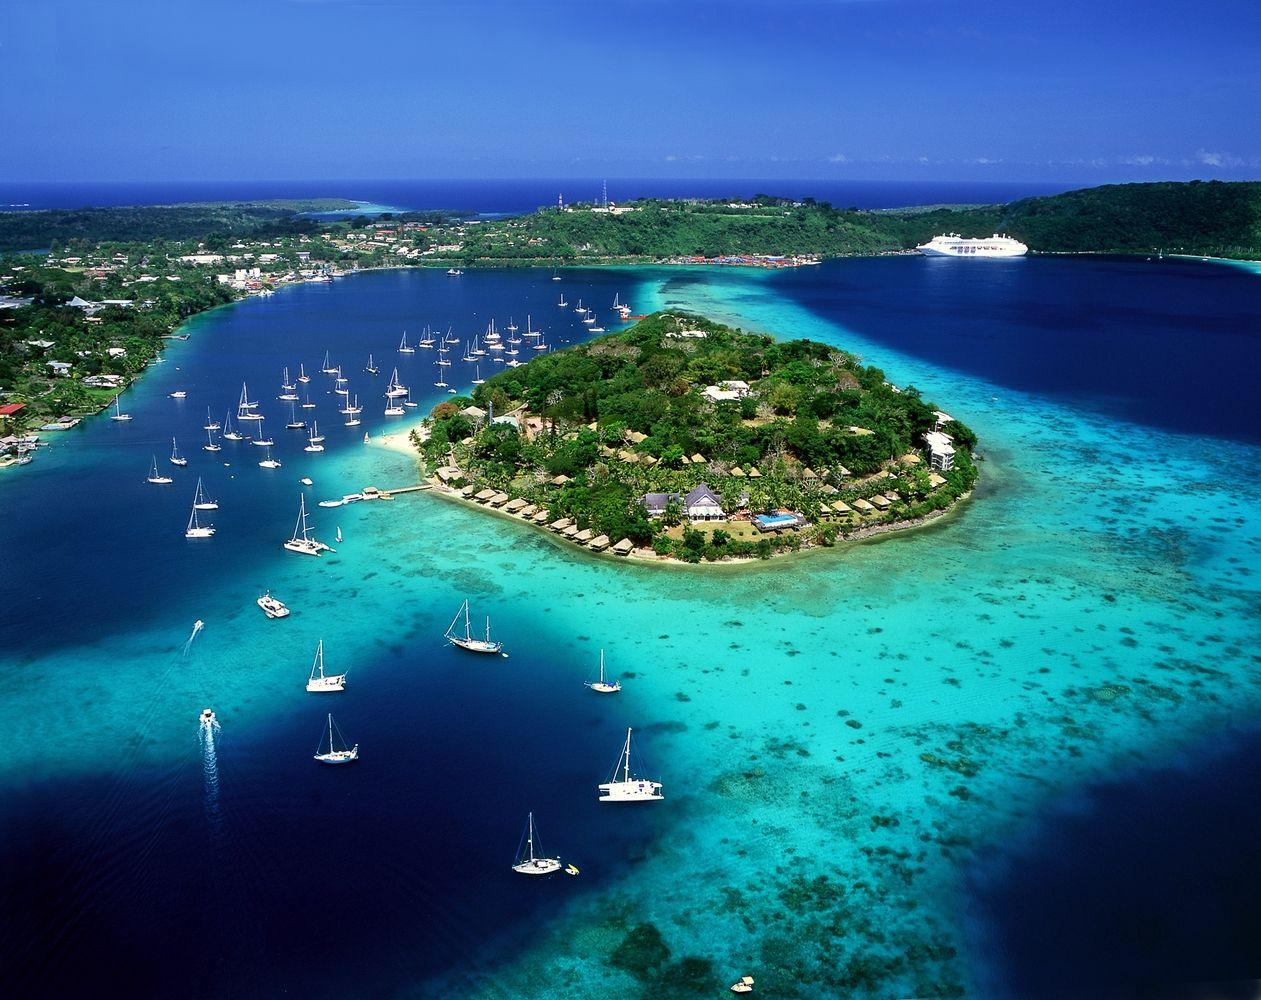 Vanuatu pilietybės kaina – 43 bitkoinai